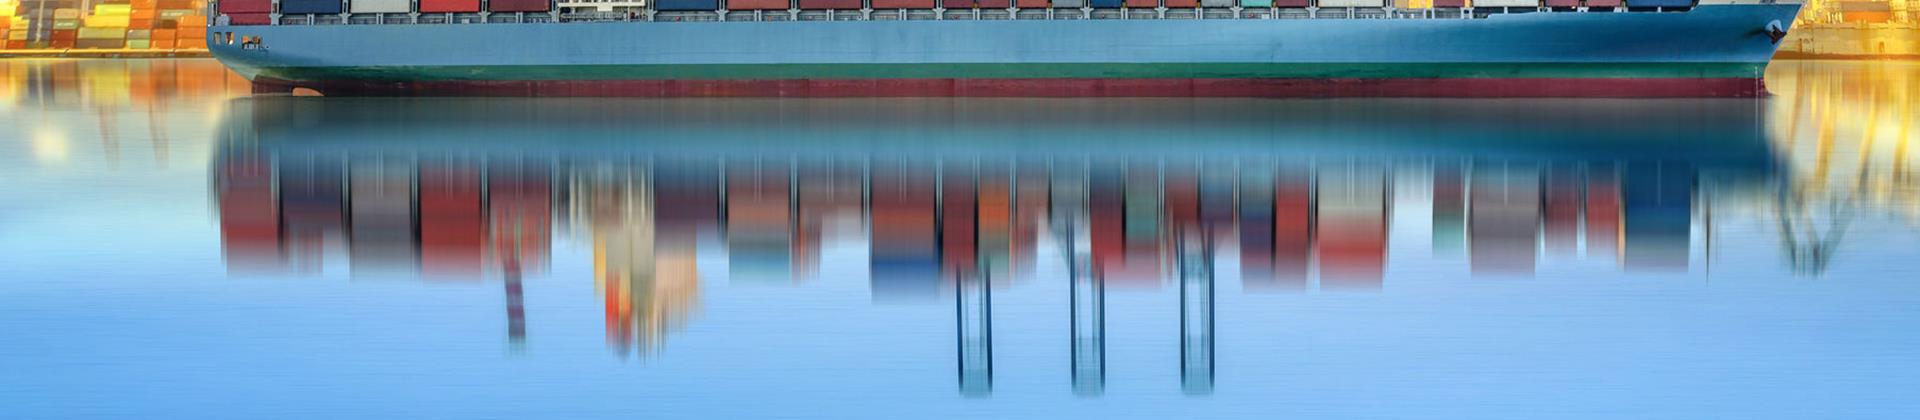 wartsila-seals-and-bearings-oil-to-water-conversions-ship